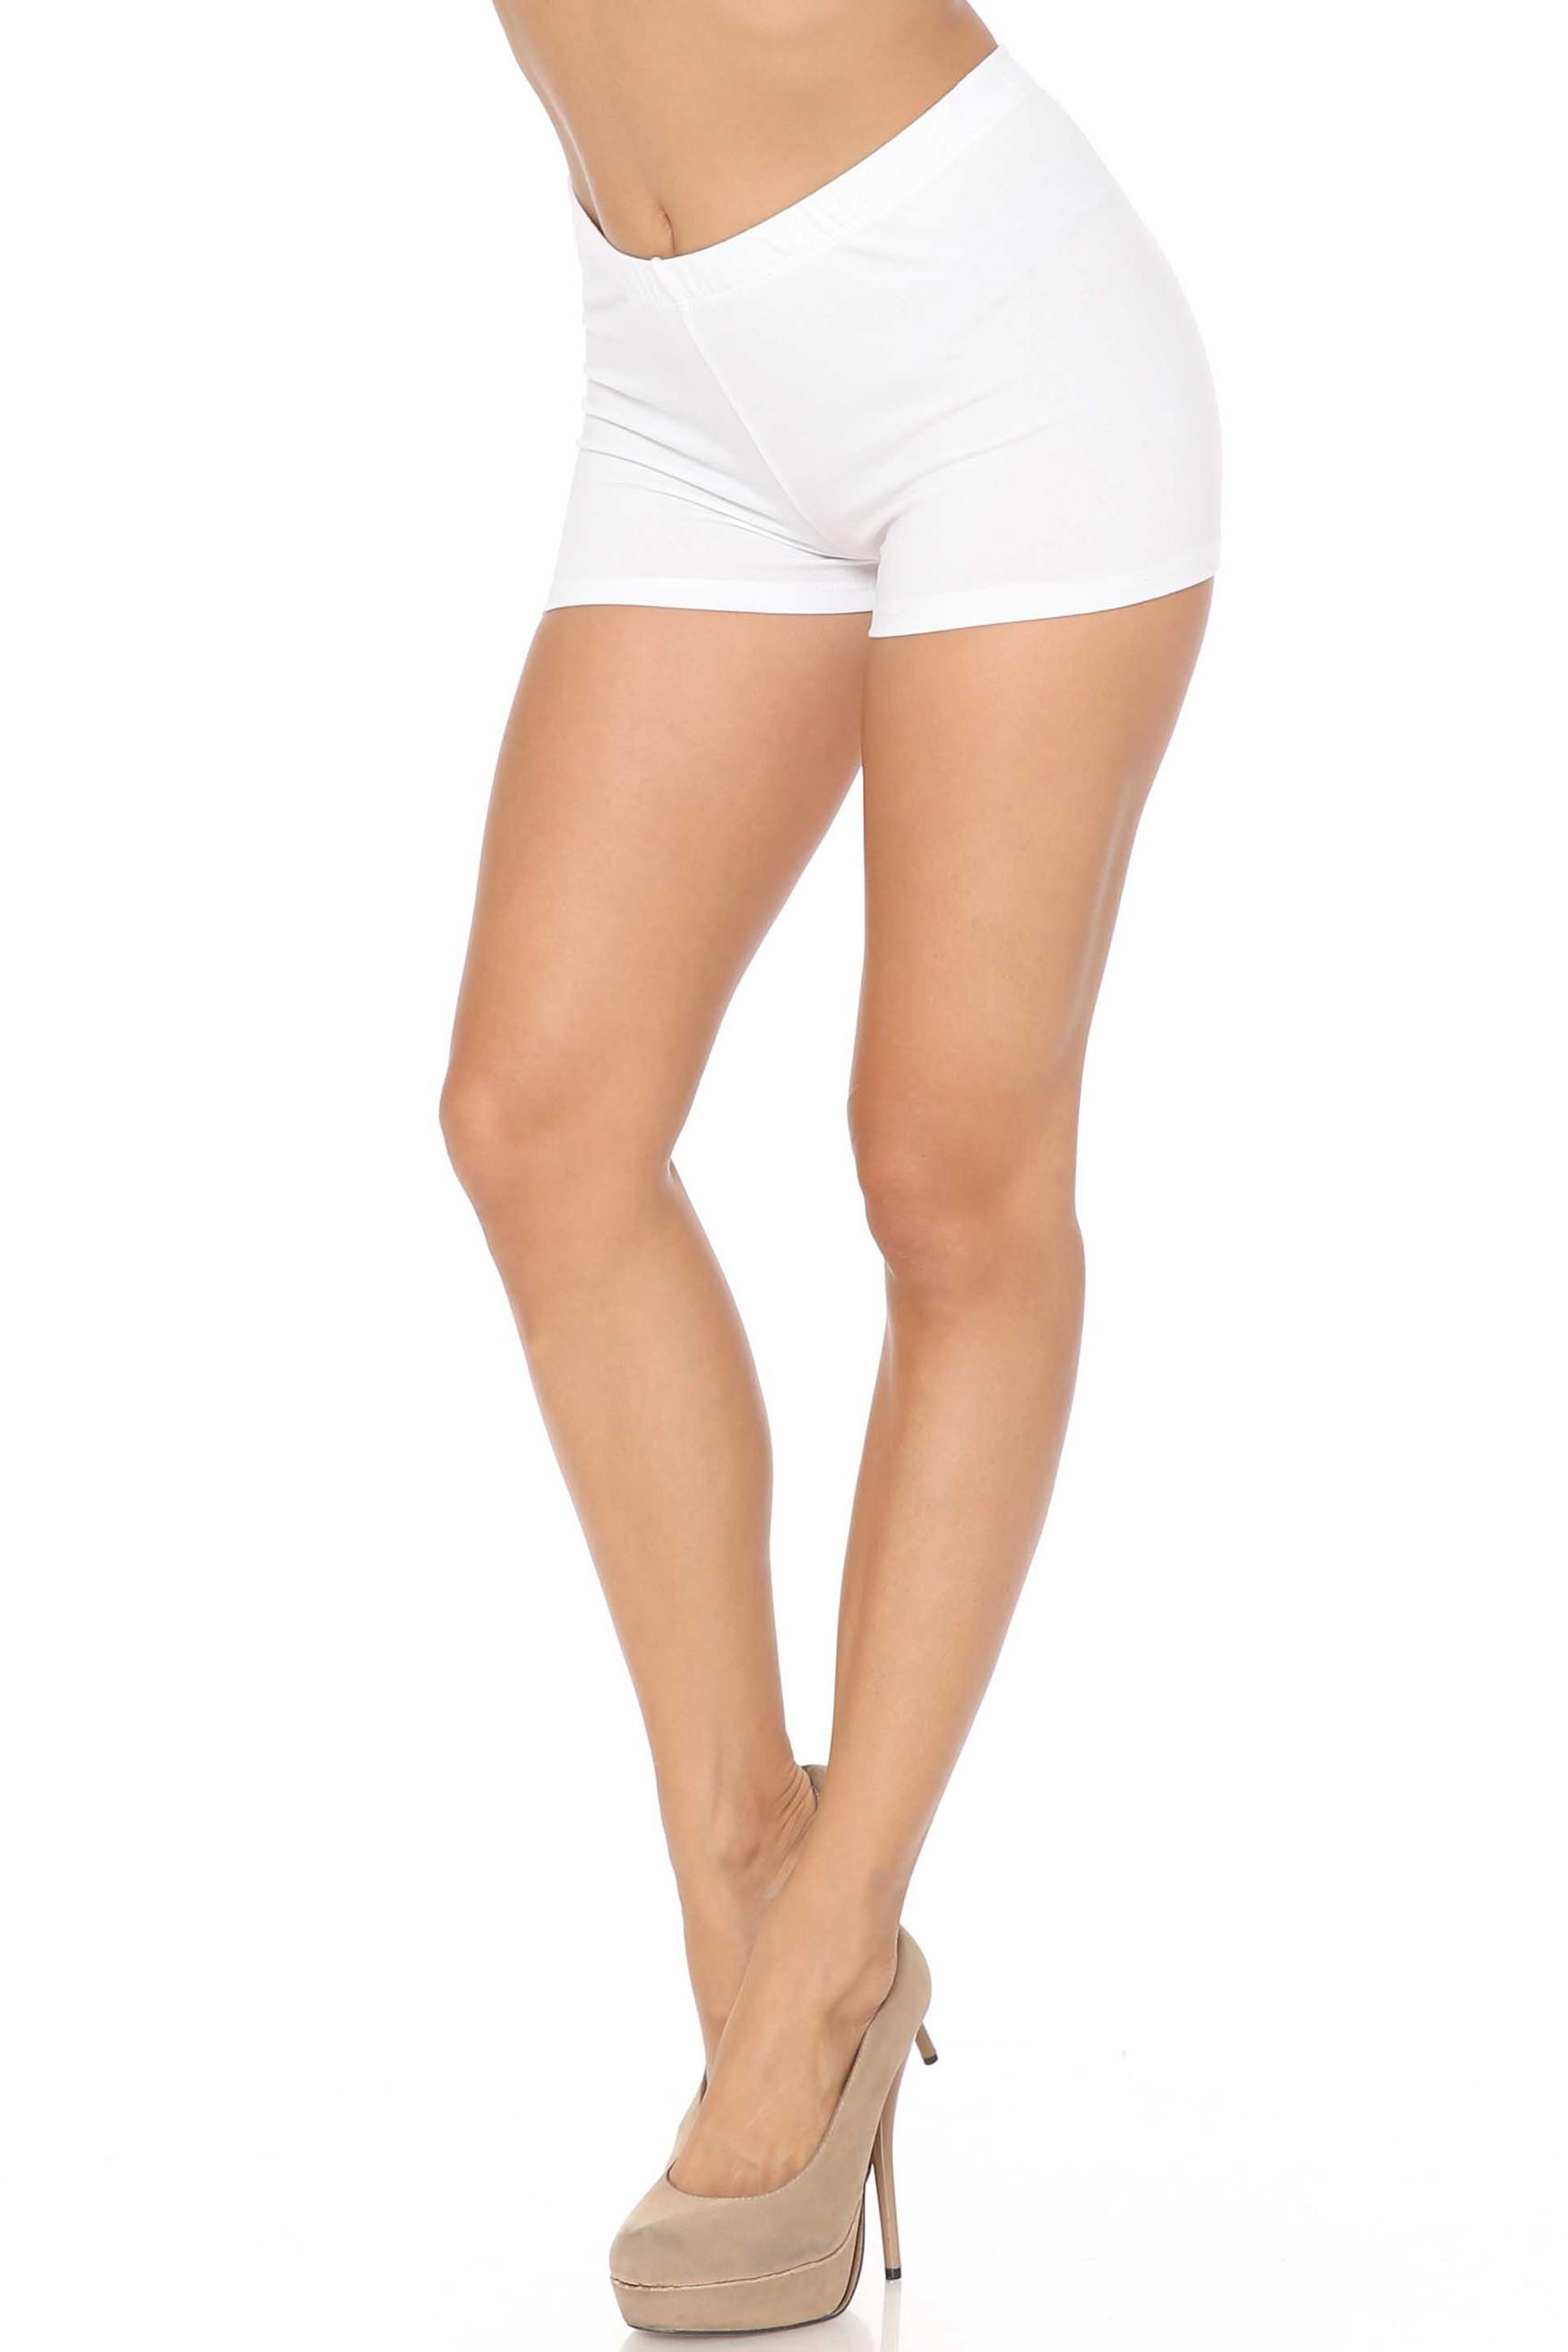 White USA Cotton Boy Shorts